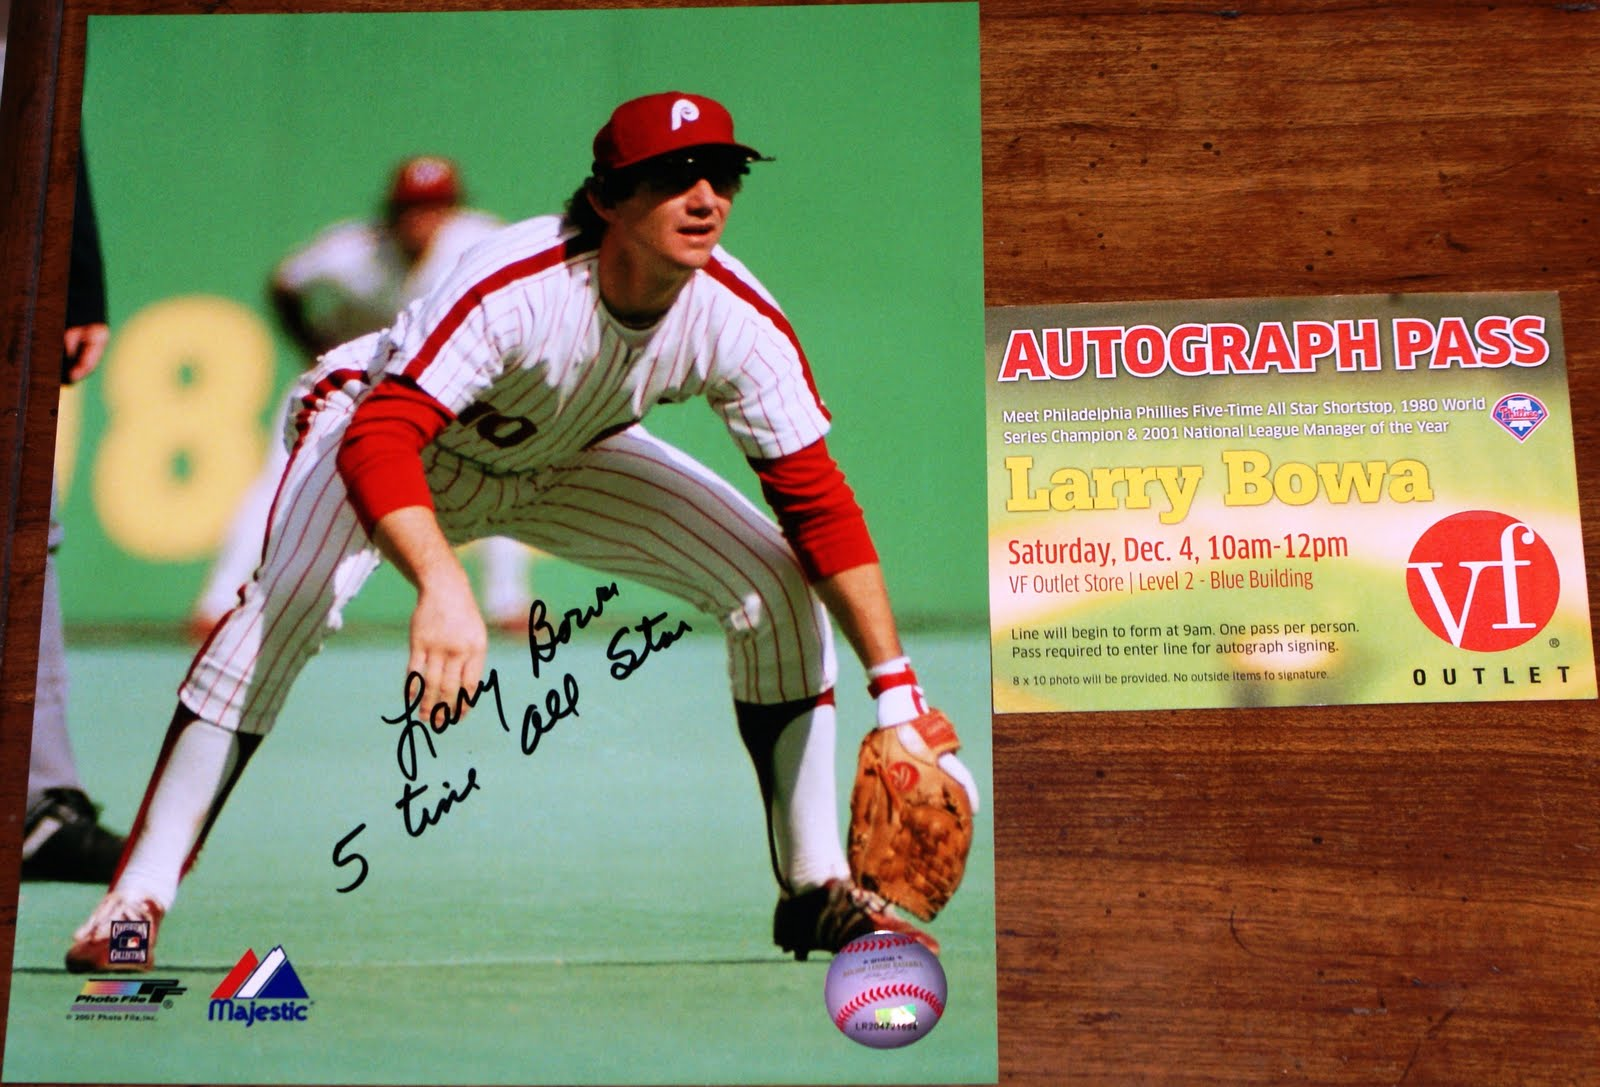 Dion's Autograph collection: Larry Bowa